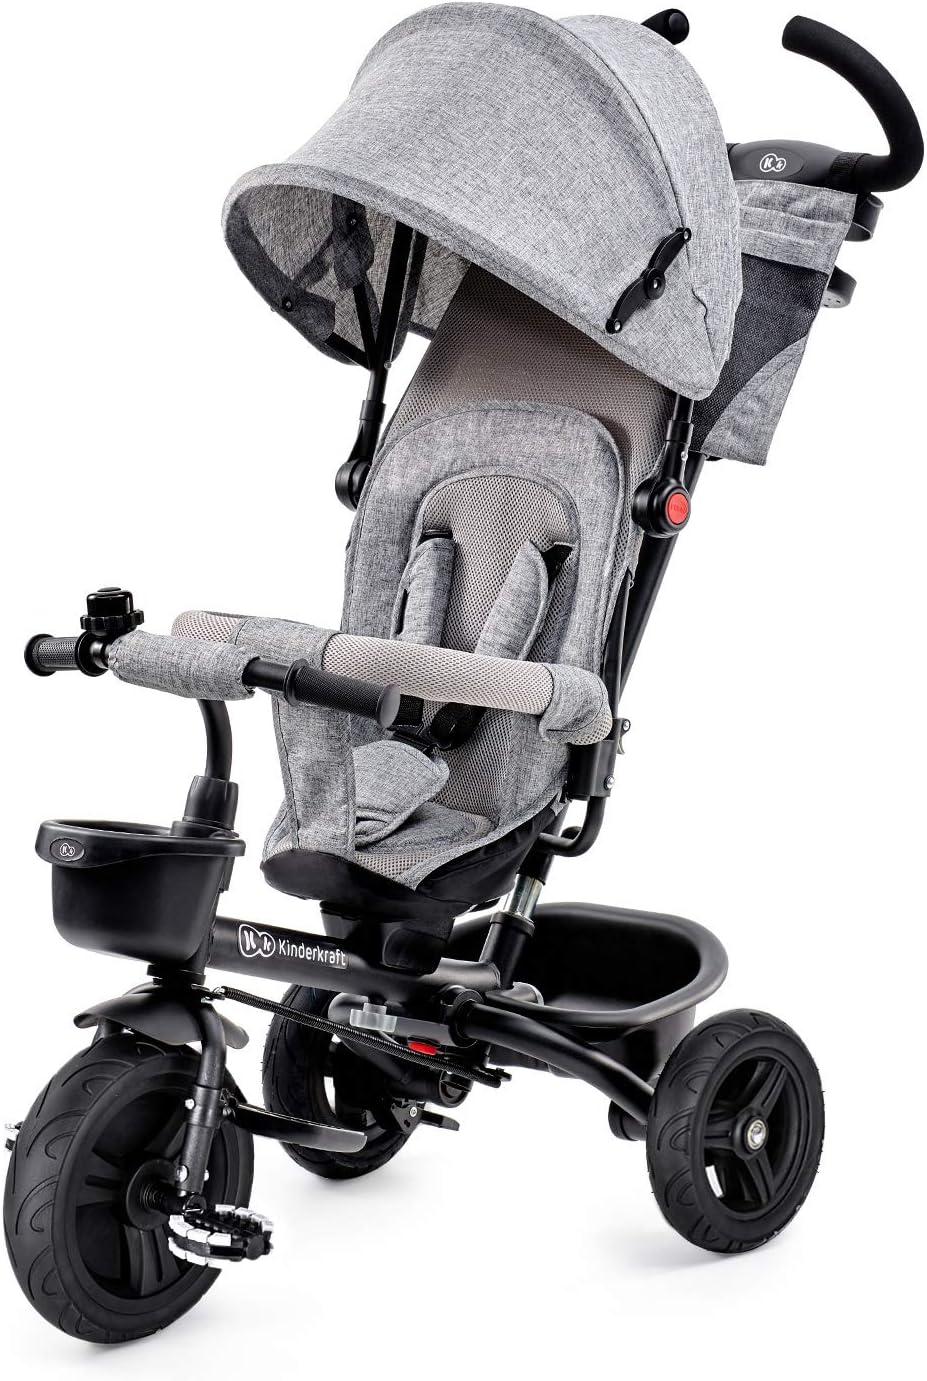 Kinderkraft Triciclo Plegable AVEO, Asiento Giratorio, Hasta 5 Años, Gris